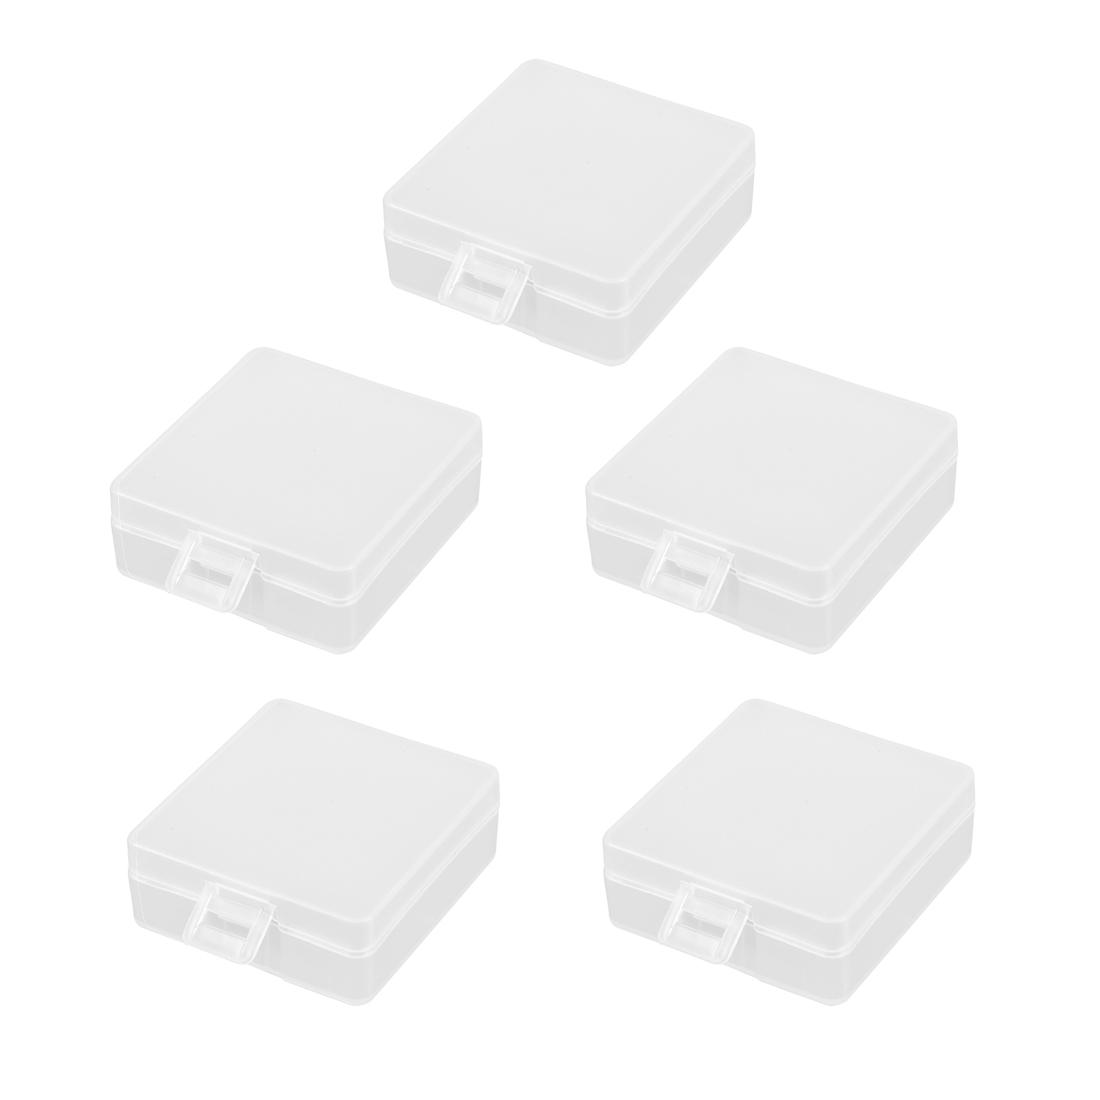 Battery Storage Case Holder Transparent For 2x9V Battery Capacity 5pcs